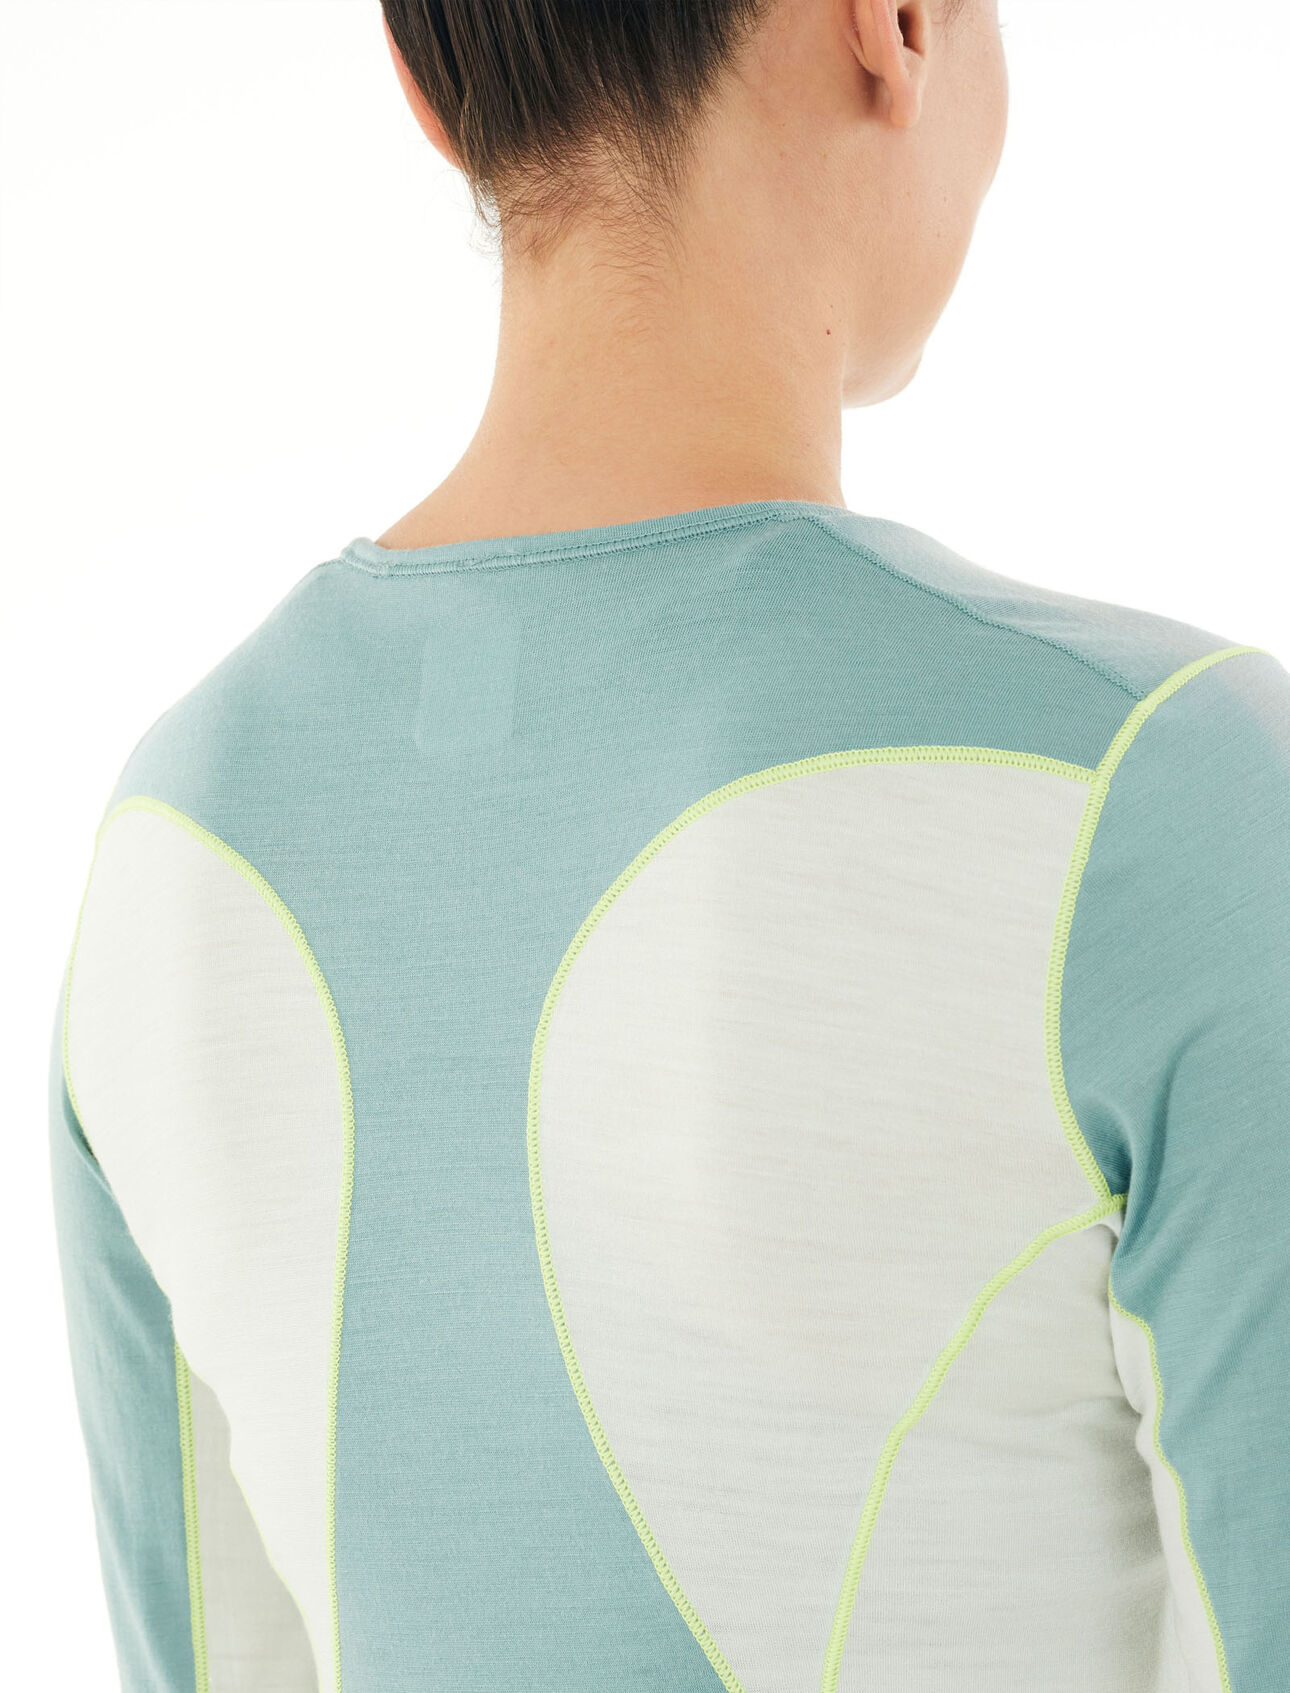 Icebreaker Wmns 200 Oasis LS Crewe Camiseta Interior Mujer